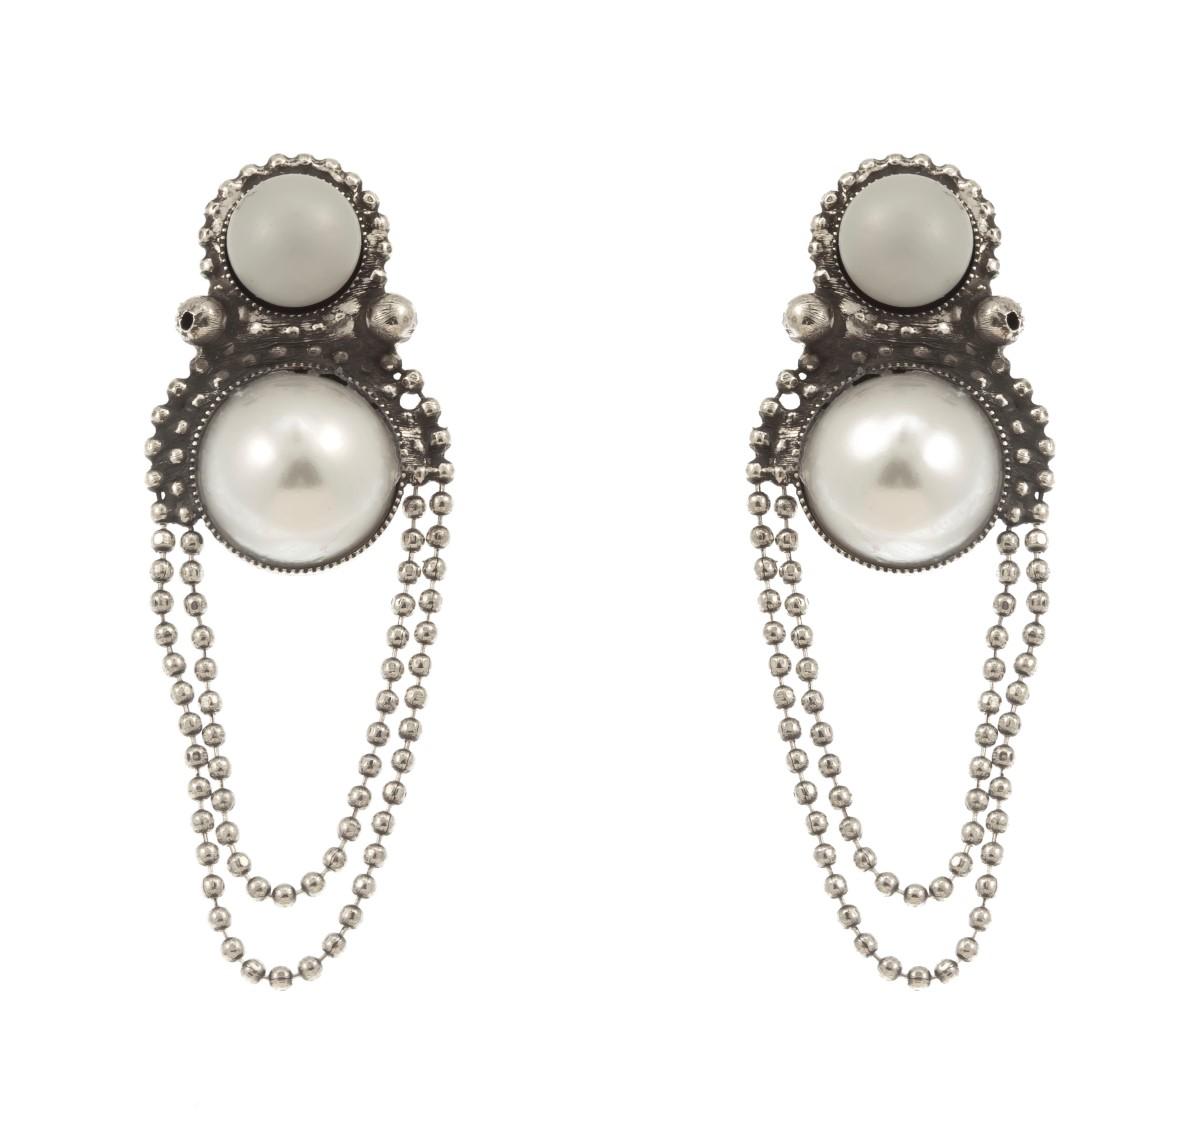 ARTWEAR DIMITRIADIS - Γυναικεία κρεμαστά σκουλαρίκια ARTWEAR DIMITRIADIS με πέρλ γυναικεία αξεσουάρ κοσμήματα σκουλαρίκια